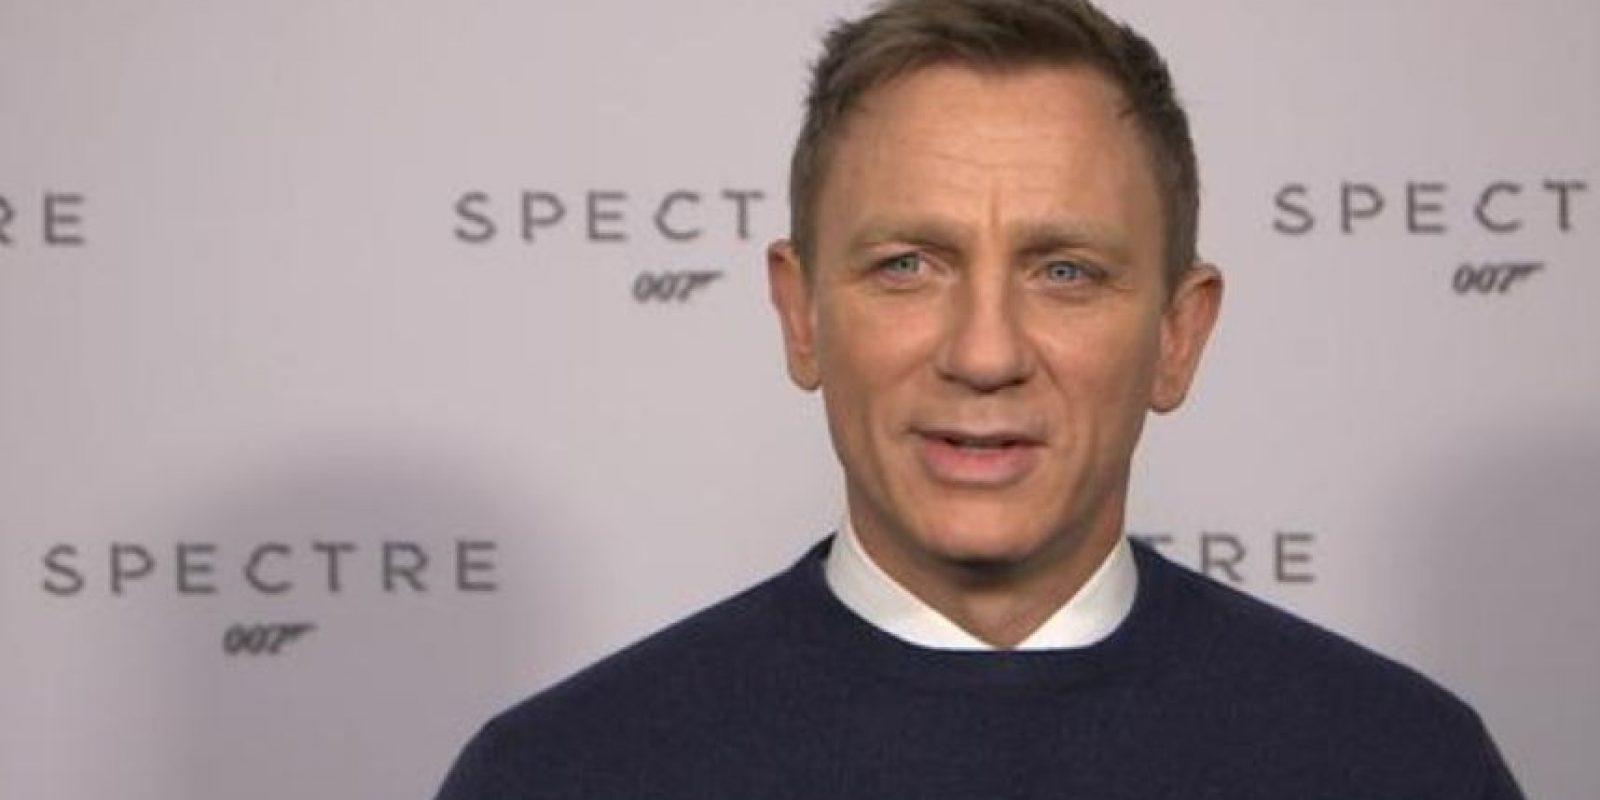 Craig generalmente va de frac a sus eventos. Foto:Getty Images